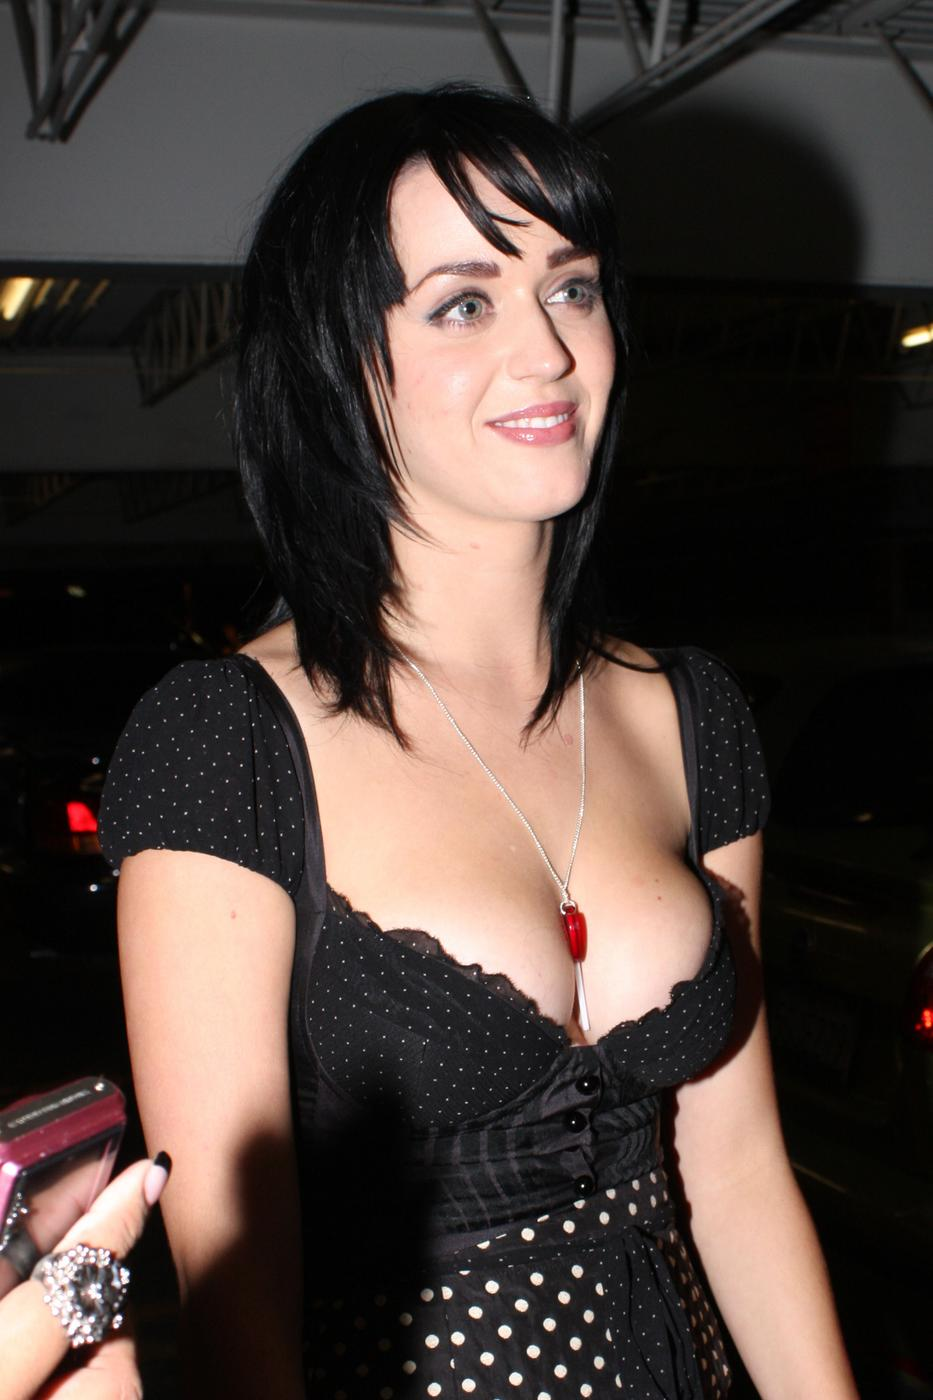 Hot Katy Perry nude photos 2019